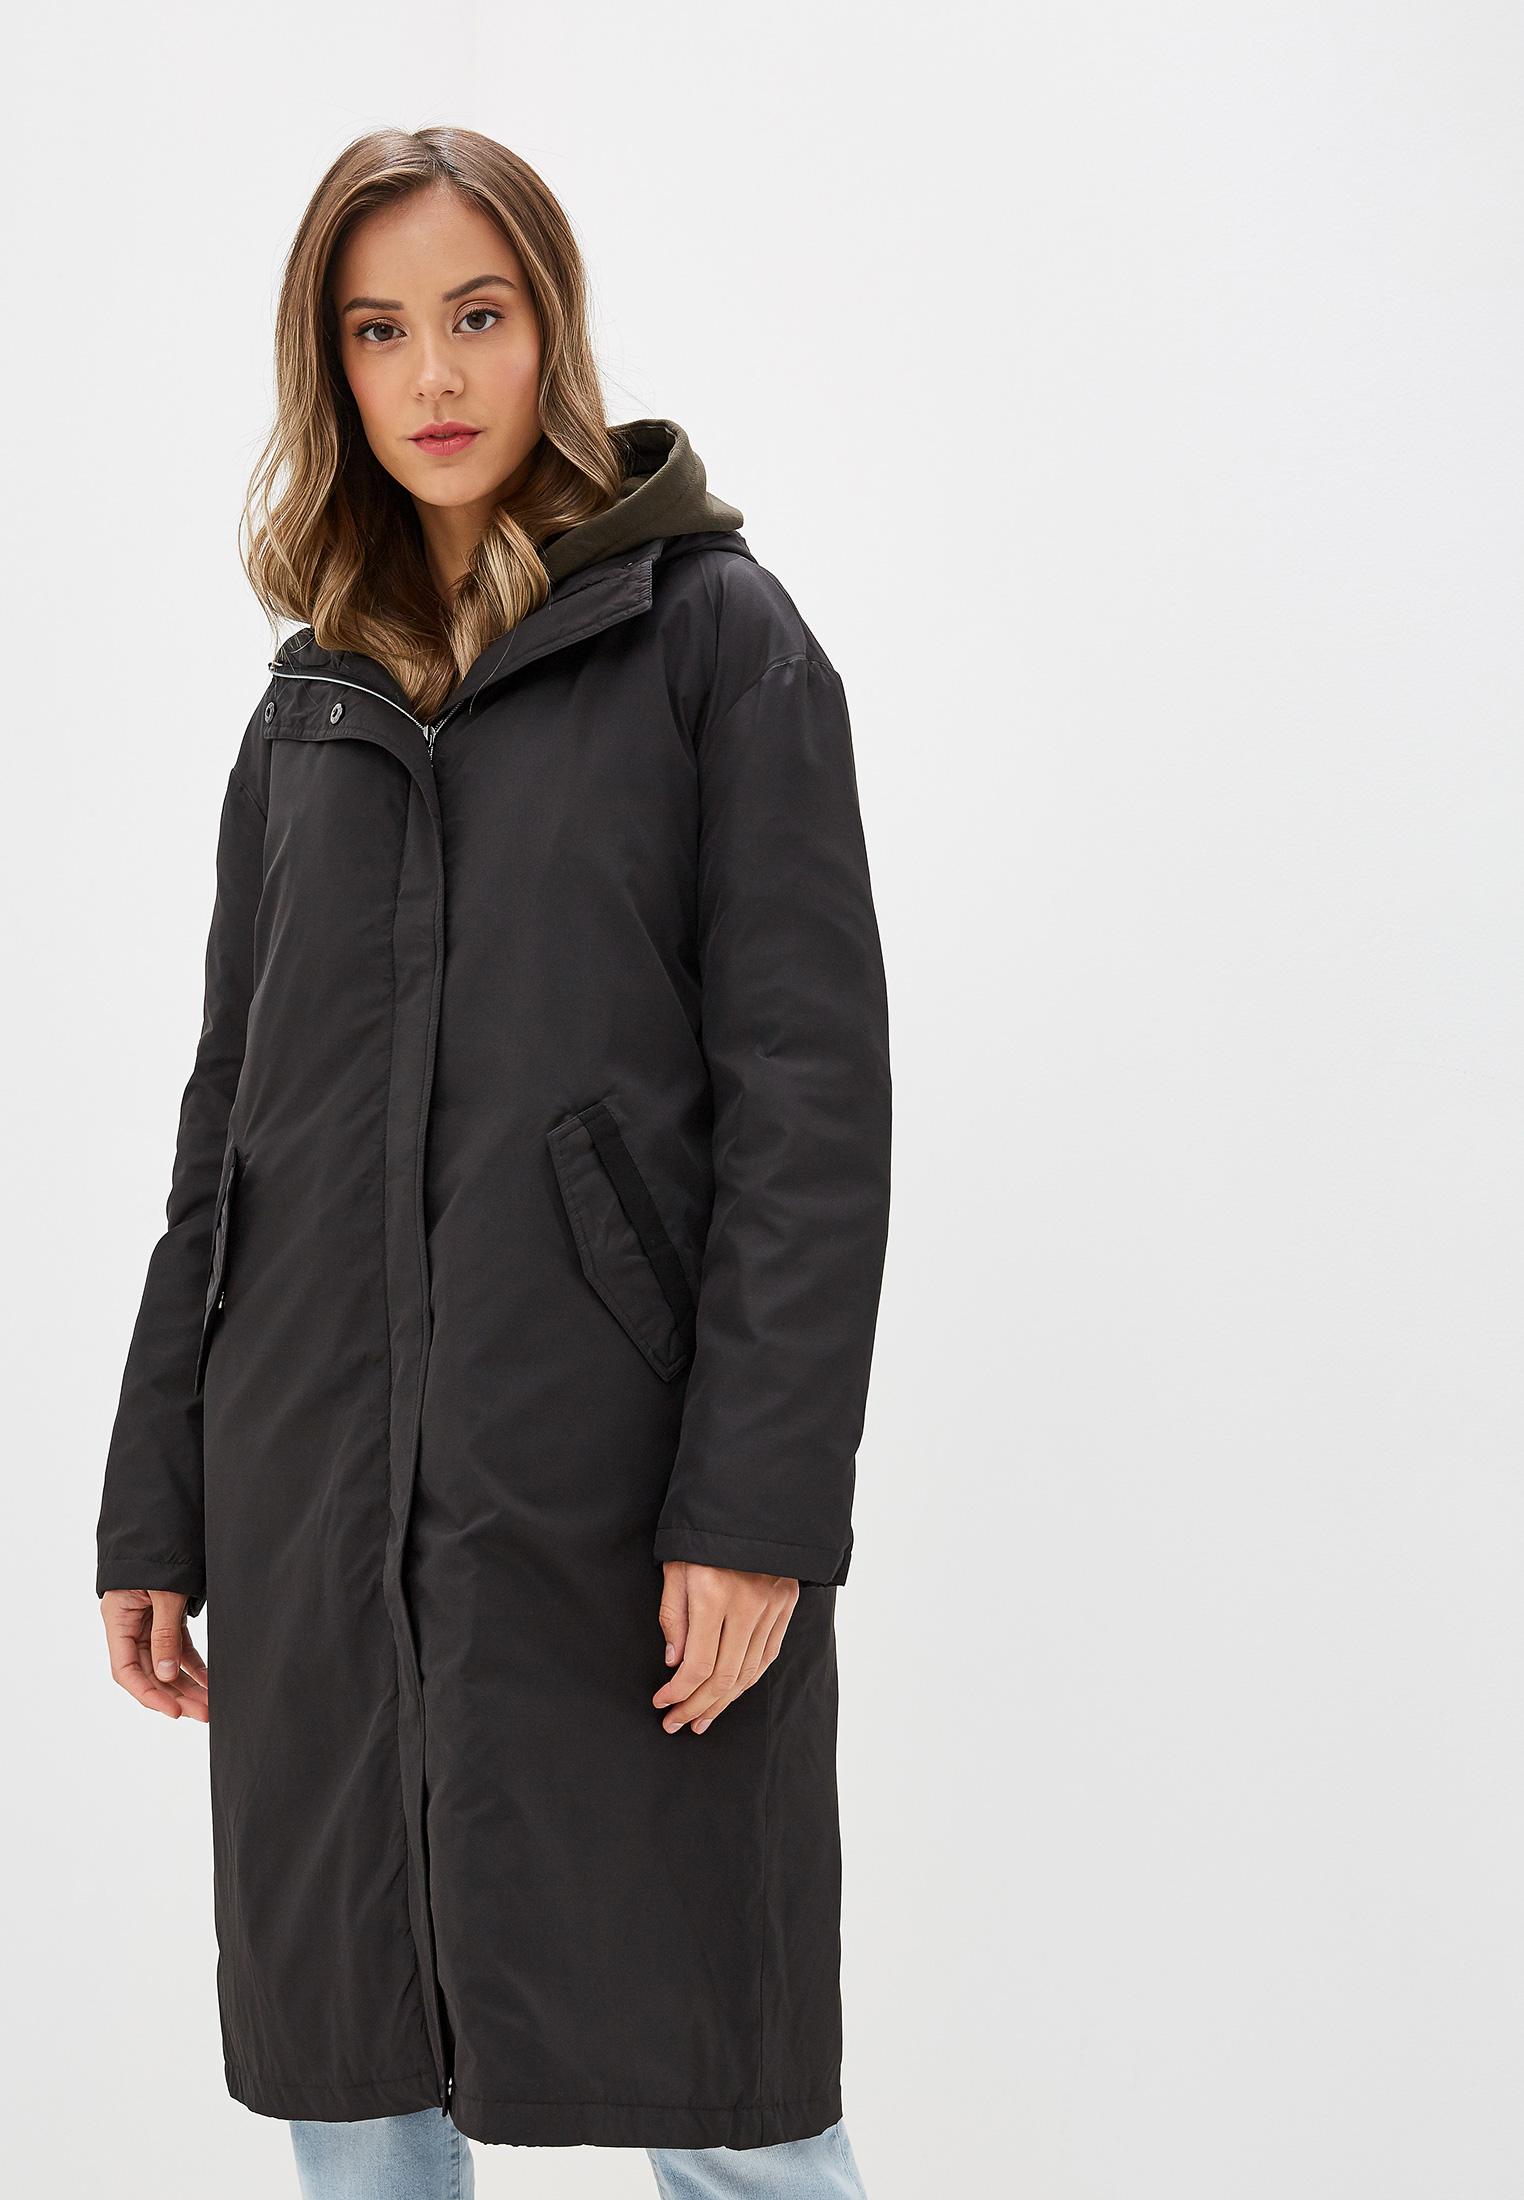 Пуховик, Savage, цвет: черный. Артикул: SA004EWGESA0. Одежда / Верхняя одежда / Пуховики и зимние куртки